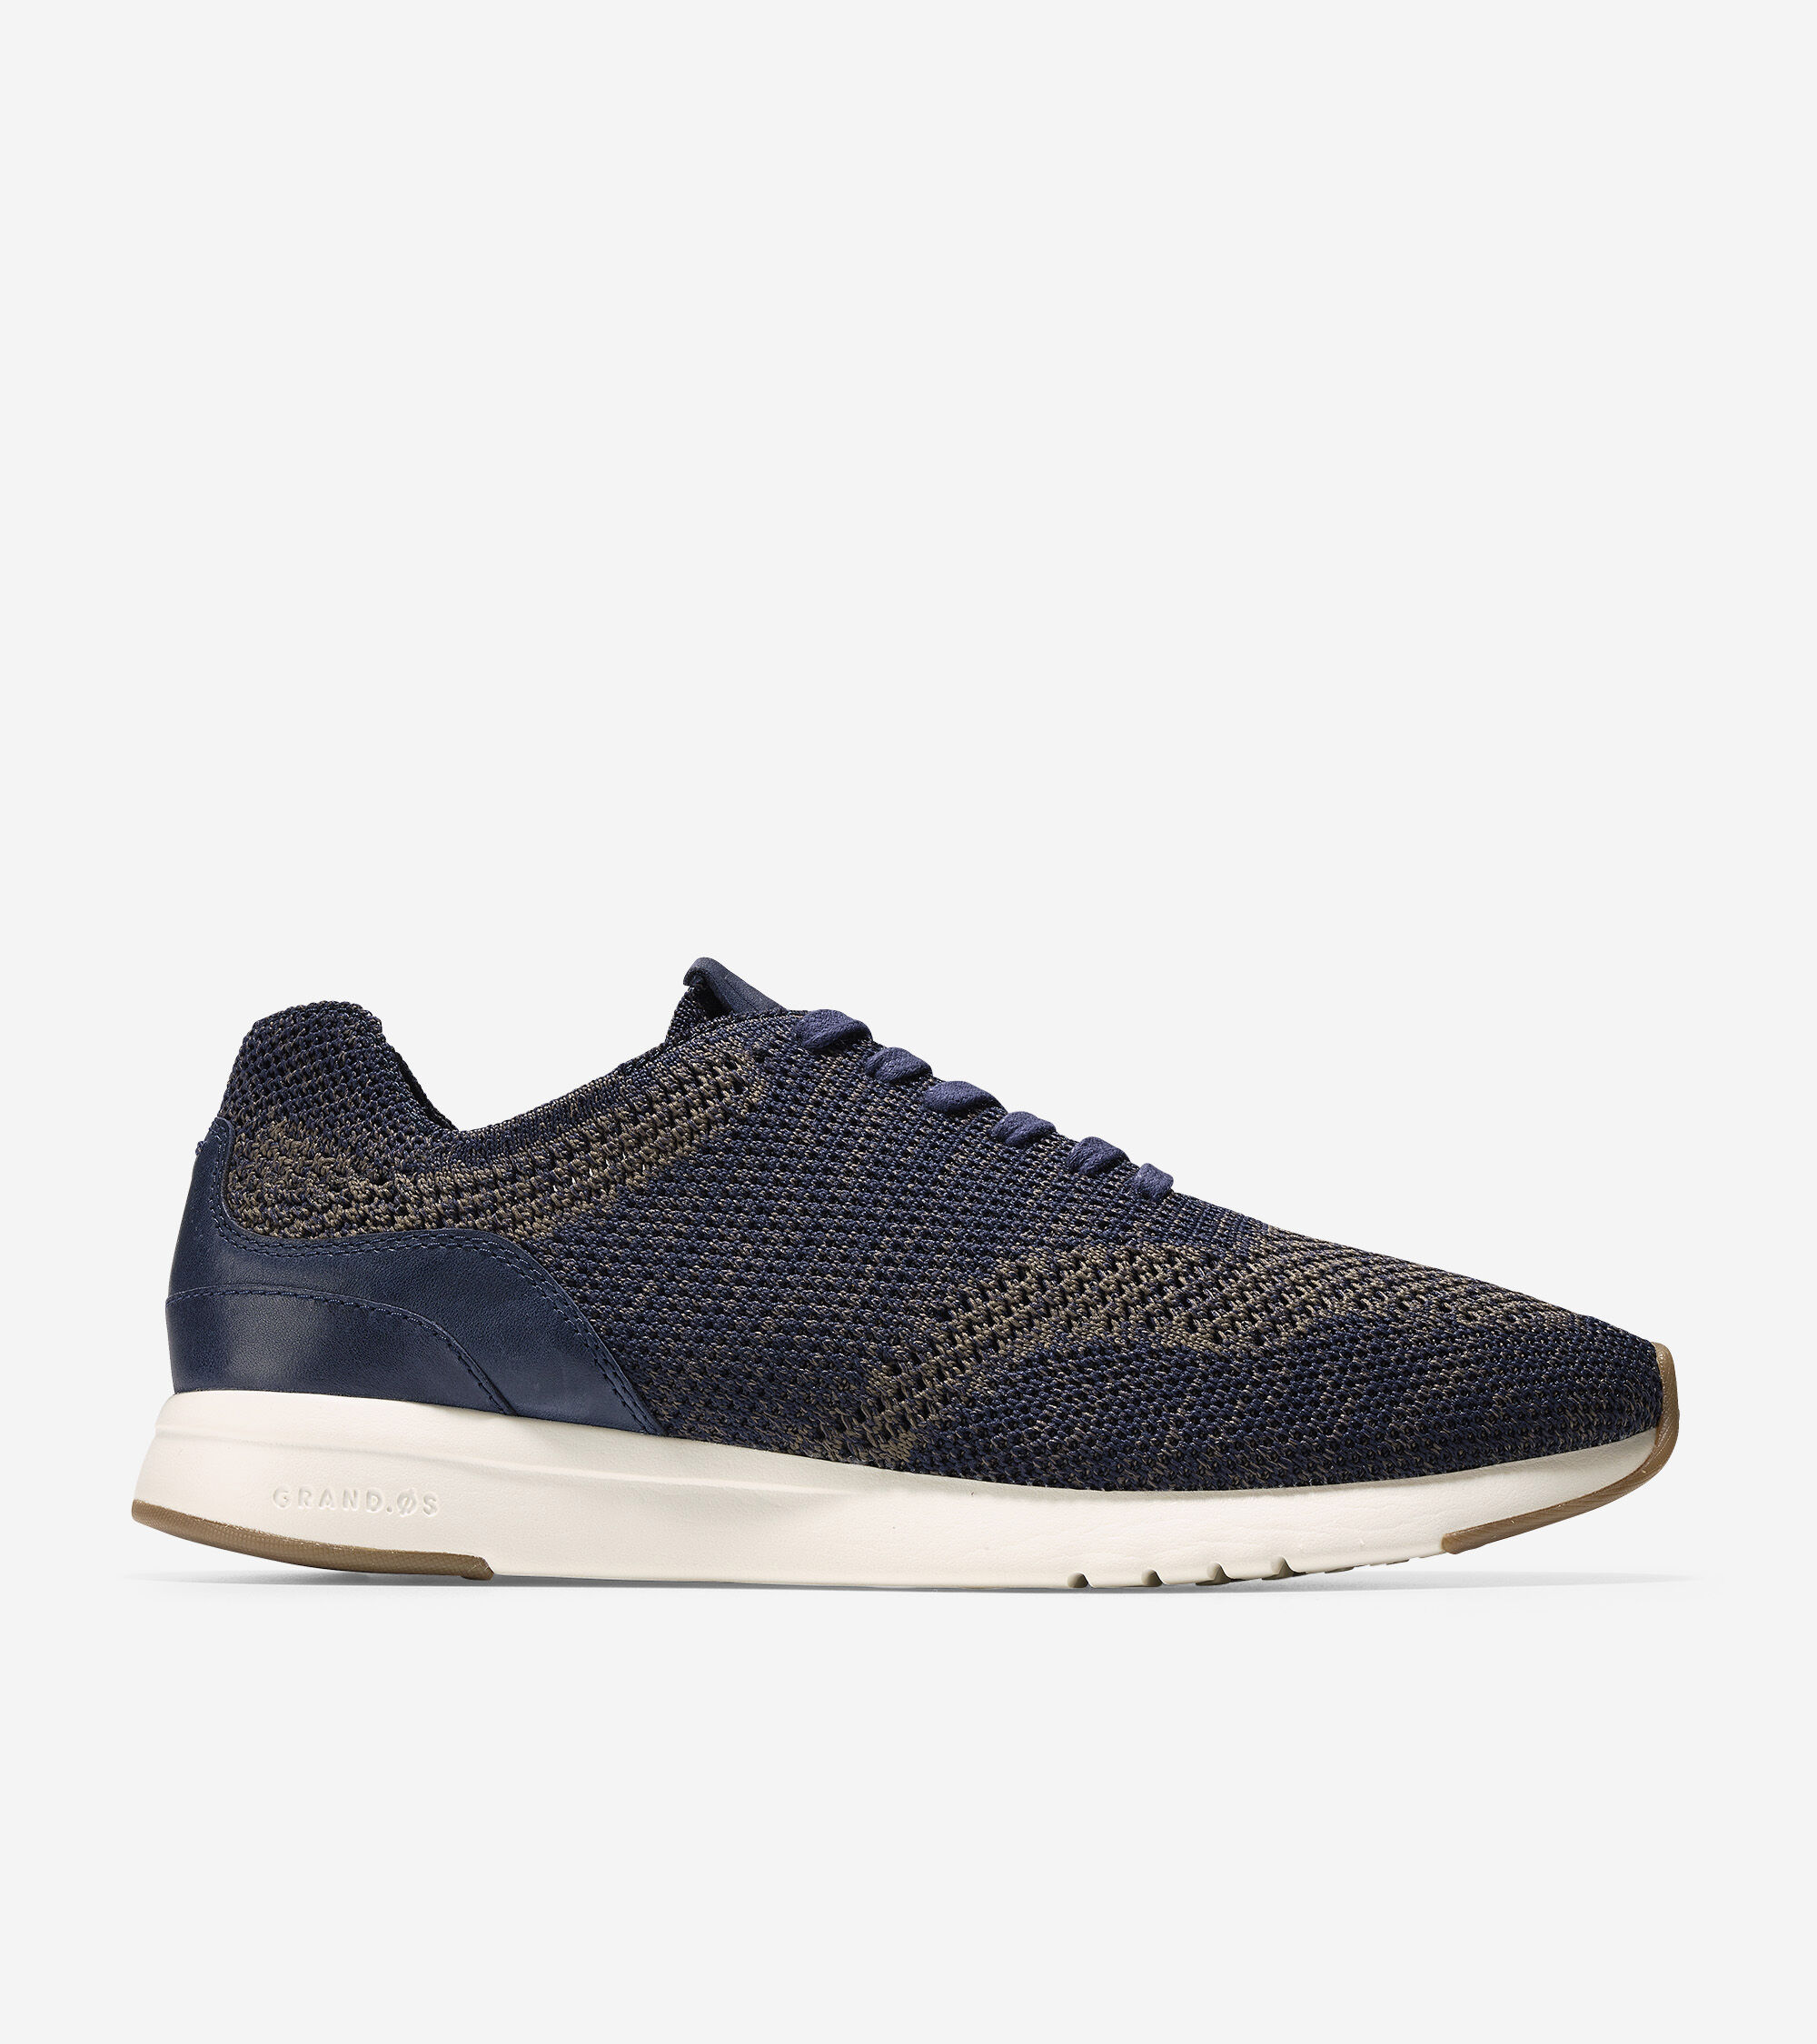 Mens Grandpro Runner Stitchlite Sneaker, Navy Peony/Morel, 10 M US Cole Haan